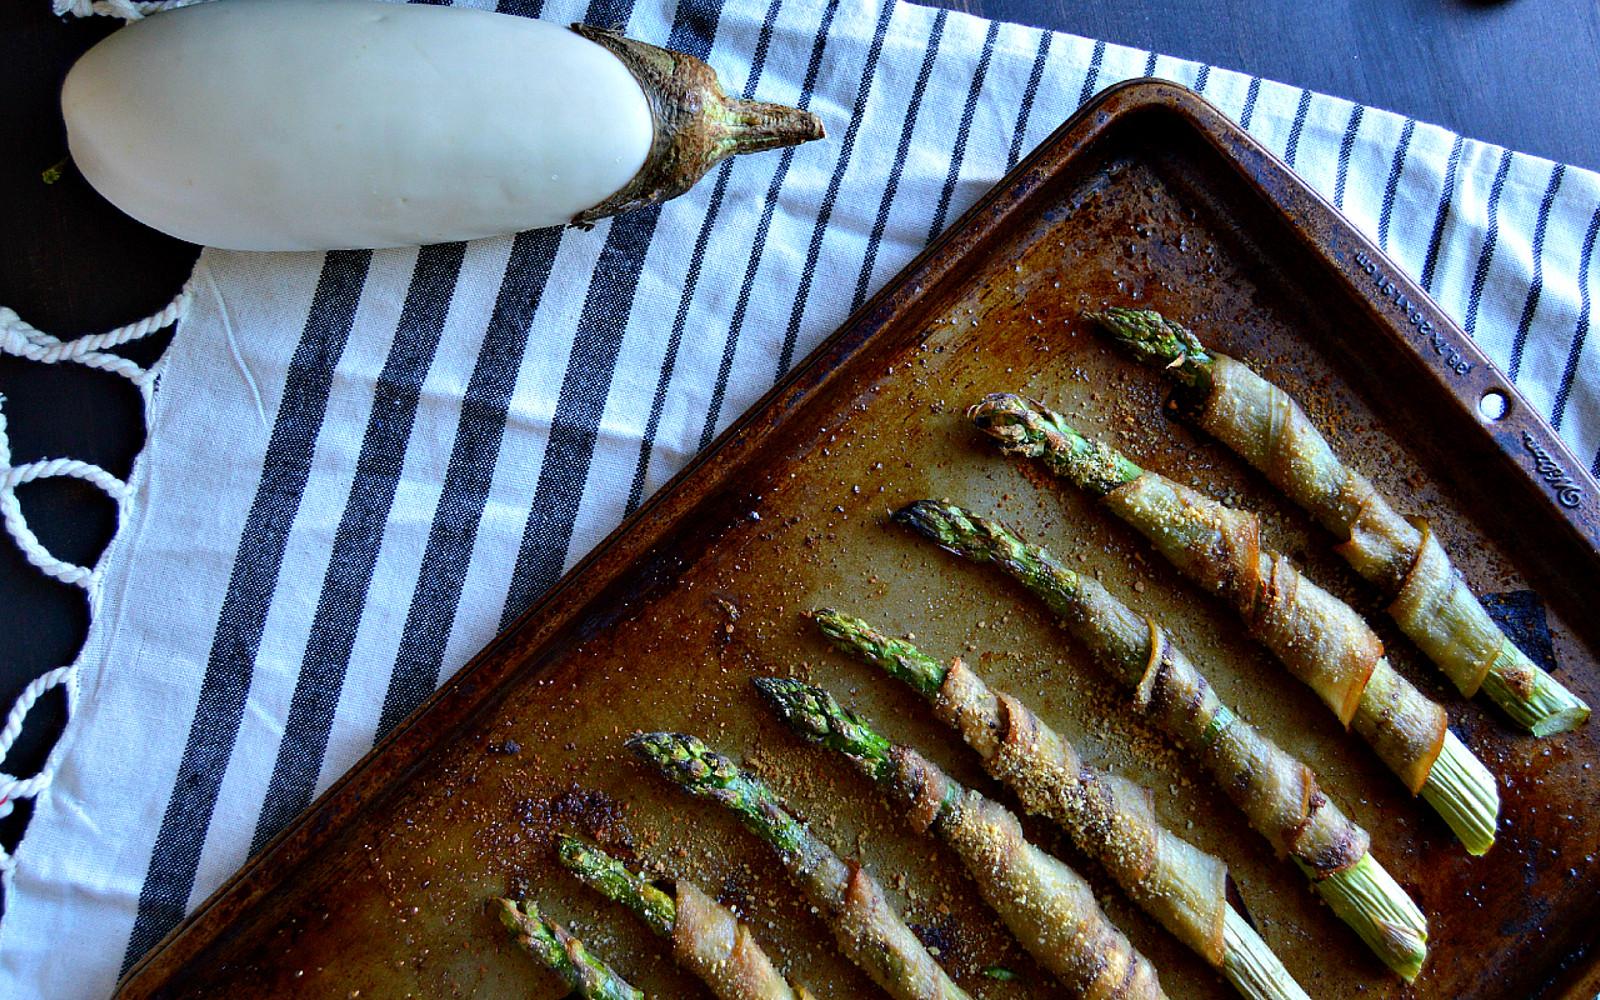 vegan eggplant bacon-wrapped asparagus